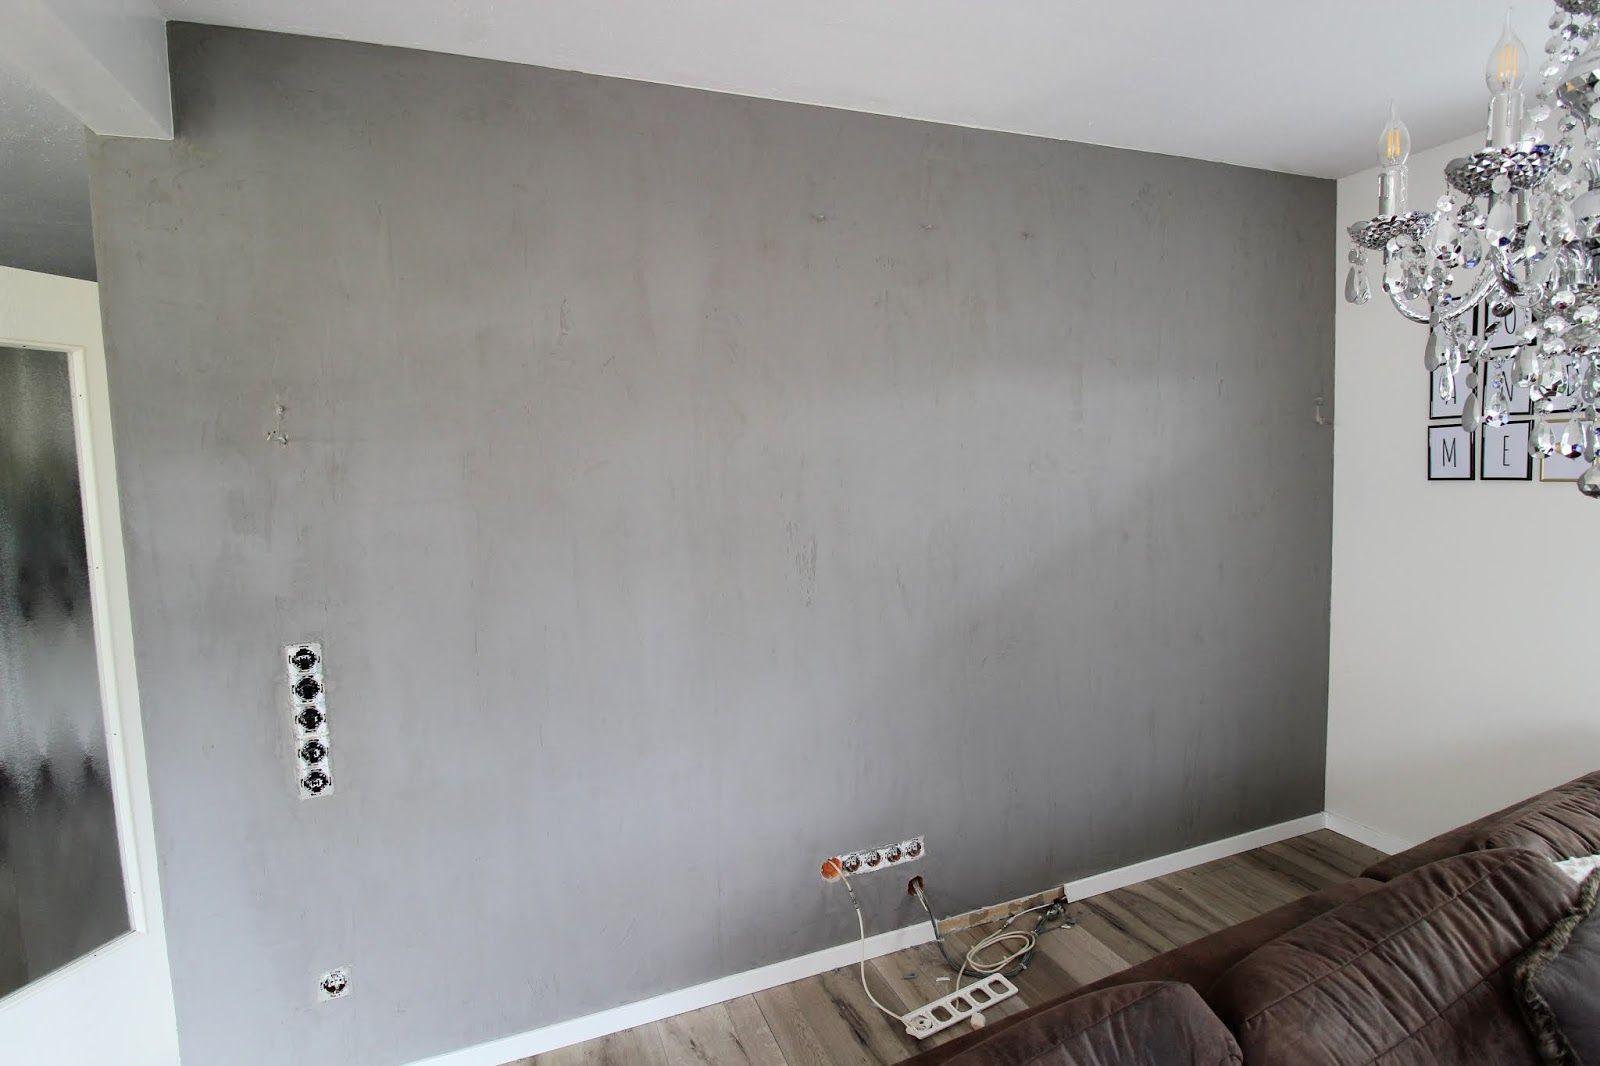 Diy Wandgestaltung In Beton Optik So Einfach Geht Es In 2020 Diy Wandgestaltung Wandgestaltung Betonoptik Wandgestaltung